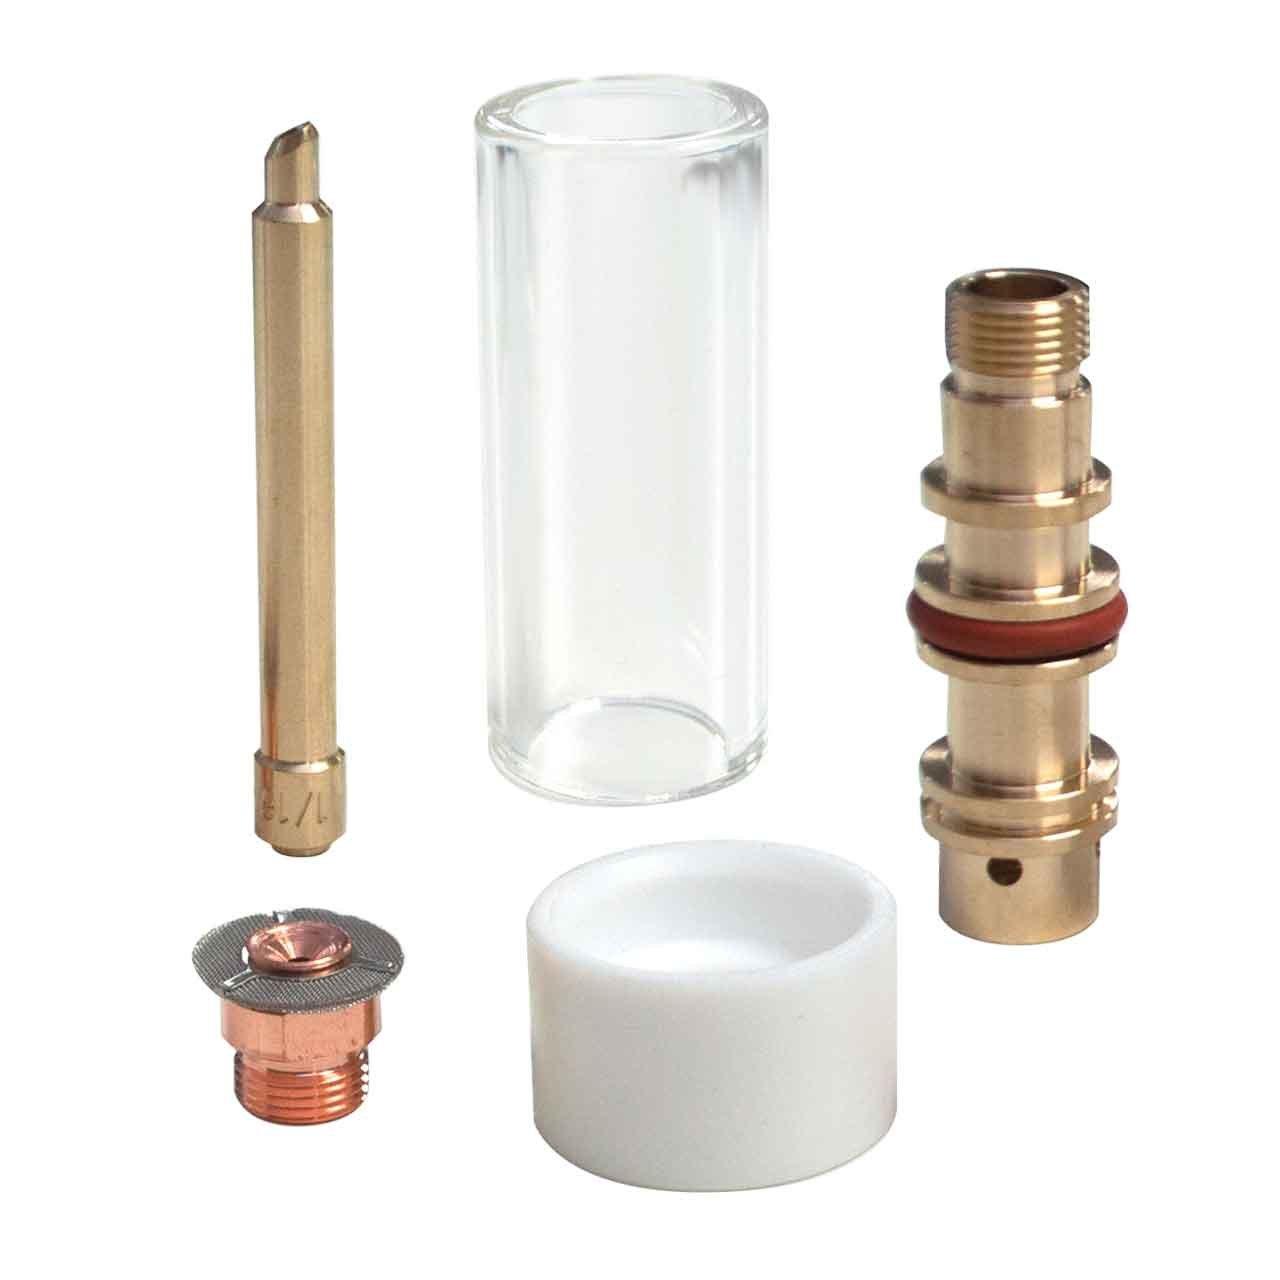 CK D3GS116-P Gas Saver Kit for 1/16' w/Pyrex Cup CK Worldwide